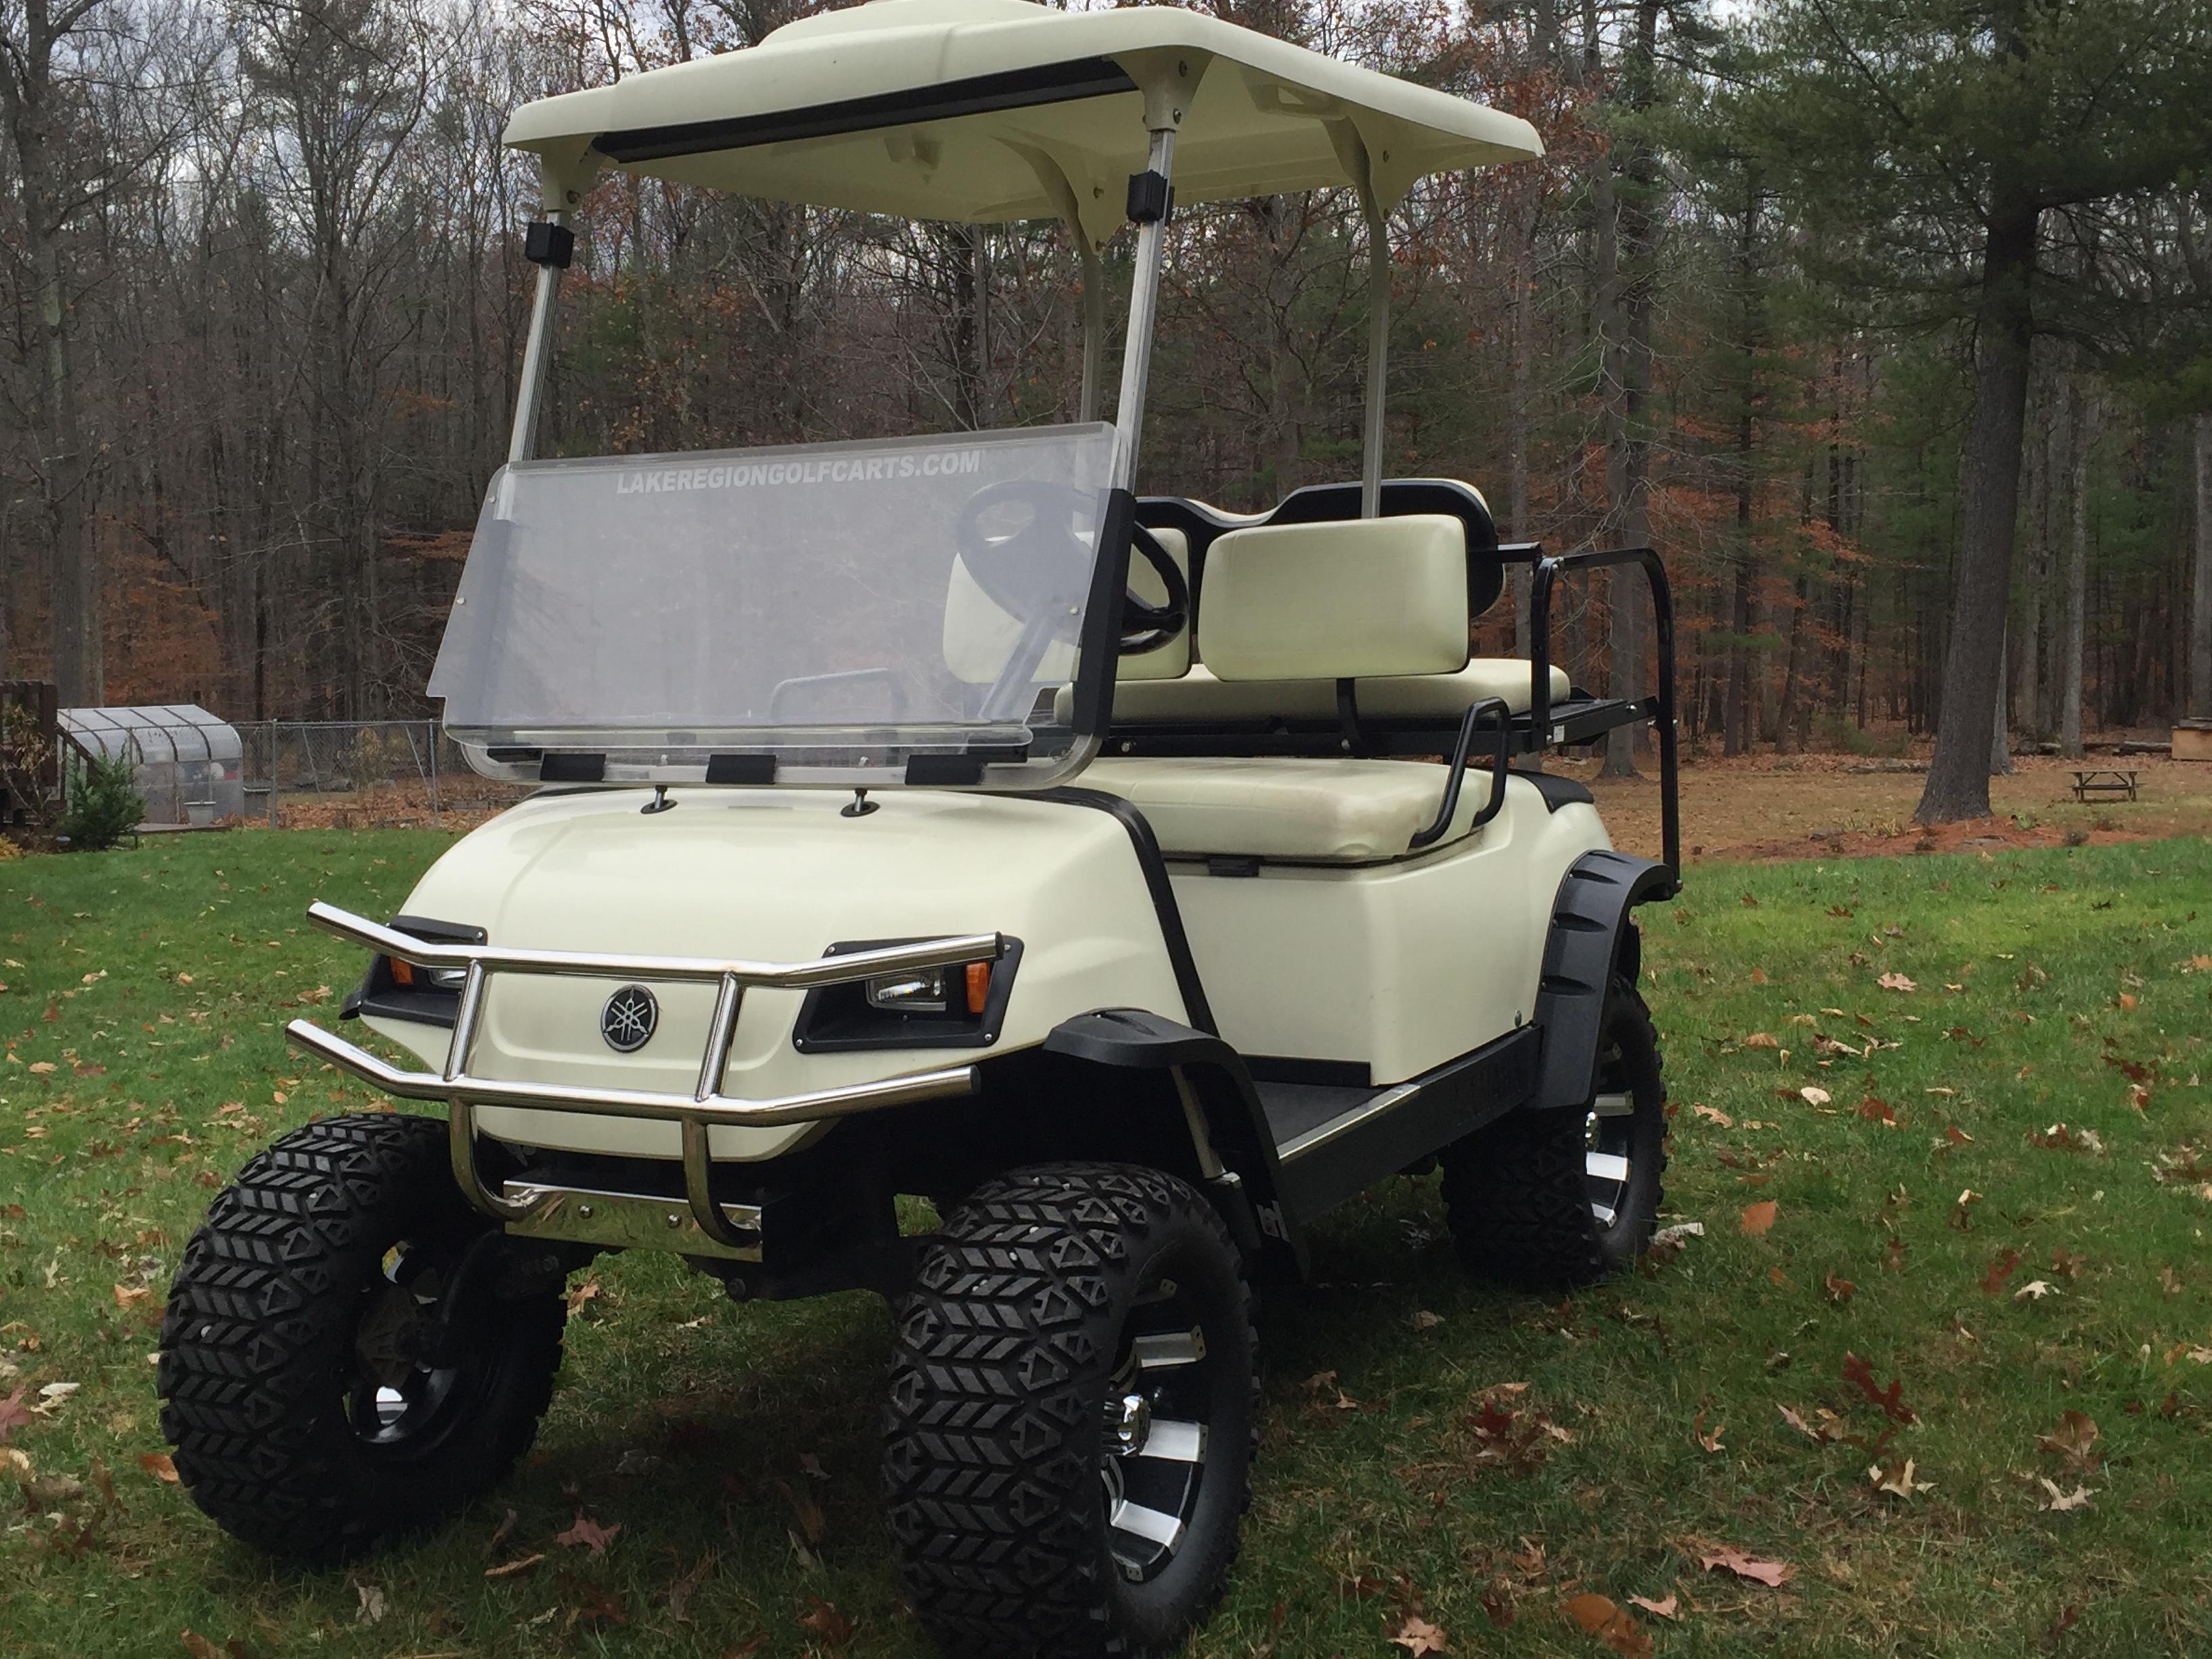 2006 Yamaha G22 with 6″ Lift Kit – LakeRegionGolfCarts.com on lifted golf carts ebay, jet-powered golf cart, airbrush custom golf cart, lifted gas golf cart, 4x4 golf cart, red lifted golf cart, 2015 ez go golf cart, lifted off-road golf carts, e-z-go rxv golf cart, best brand gas golf cart, used street-legal golf cart, used 6 seater golf cart, lifted golf cart tires, redneck golf cart, rat rod golf cart, lifted hyundai golf cart, lifted custom golf cart, craigslist harley golf cart, snowboard golf cart, lifted electric golf cart,